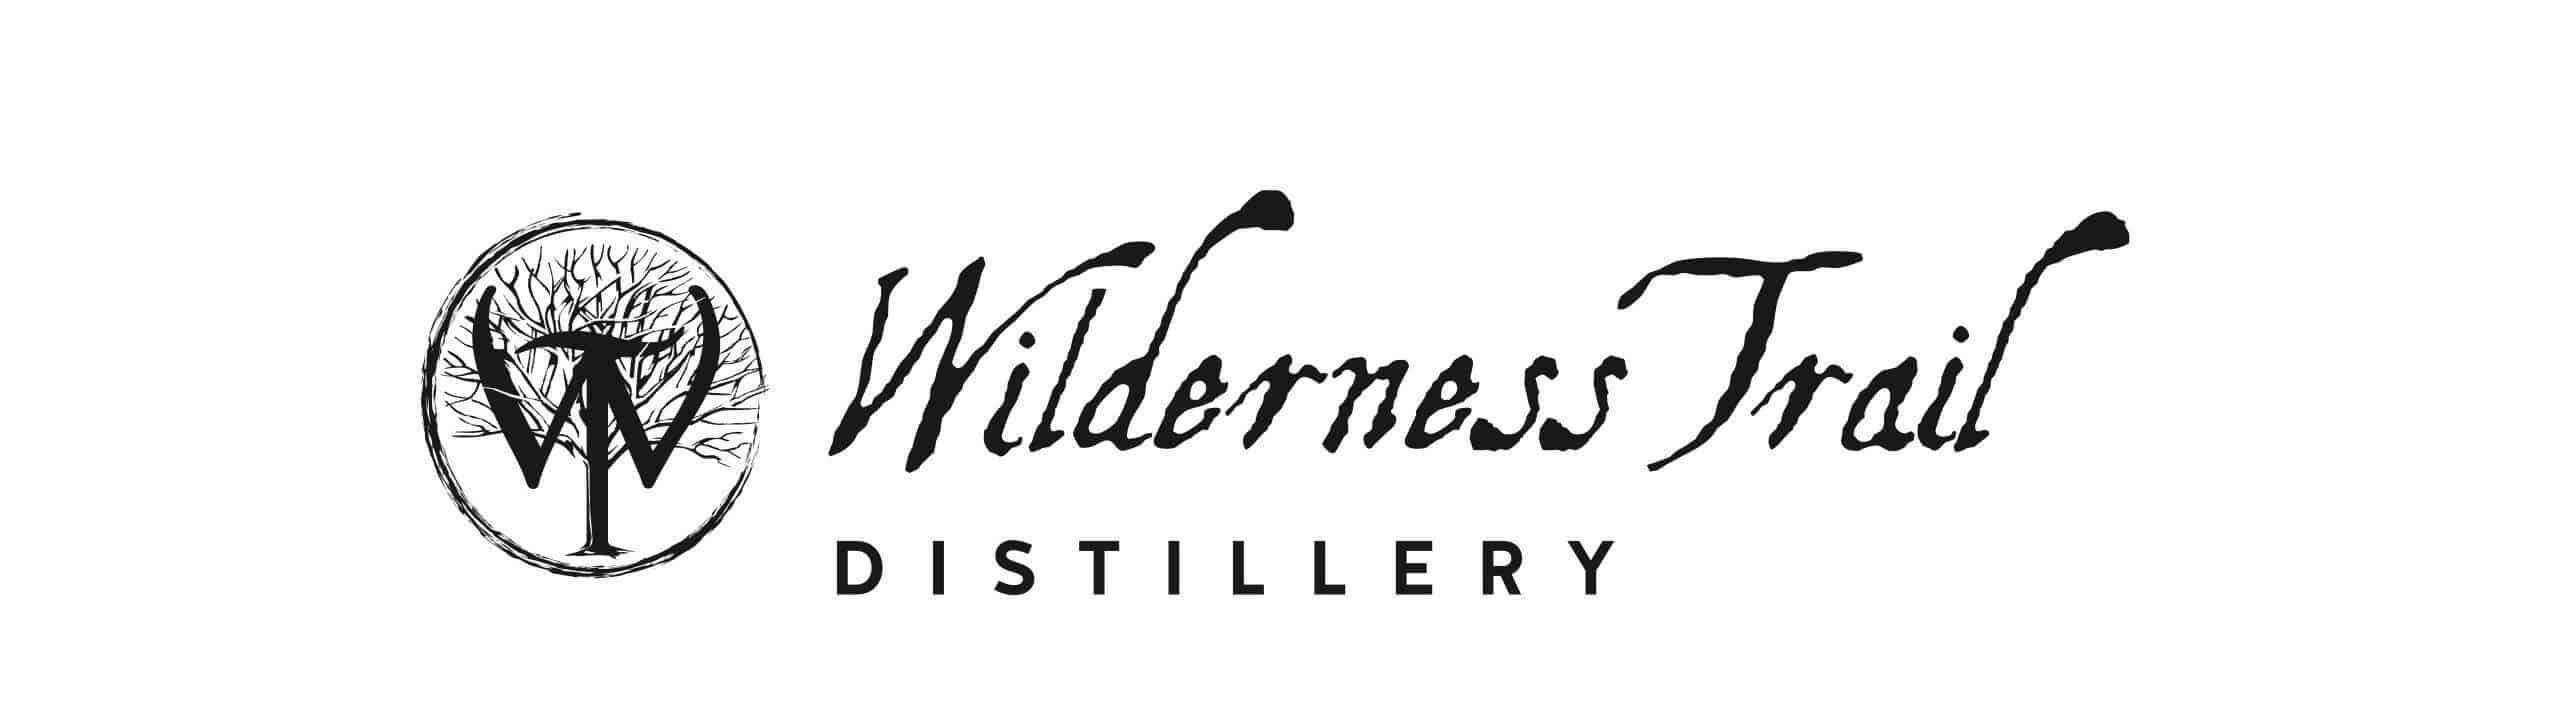 Wilderness Trail Logo NEW - Wilderness Trail Distillery Charity Cook Off